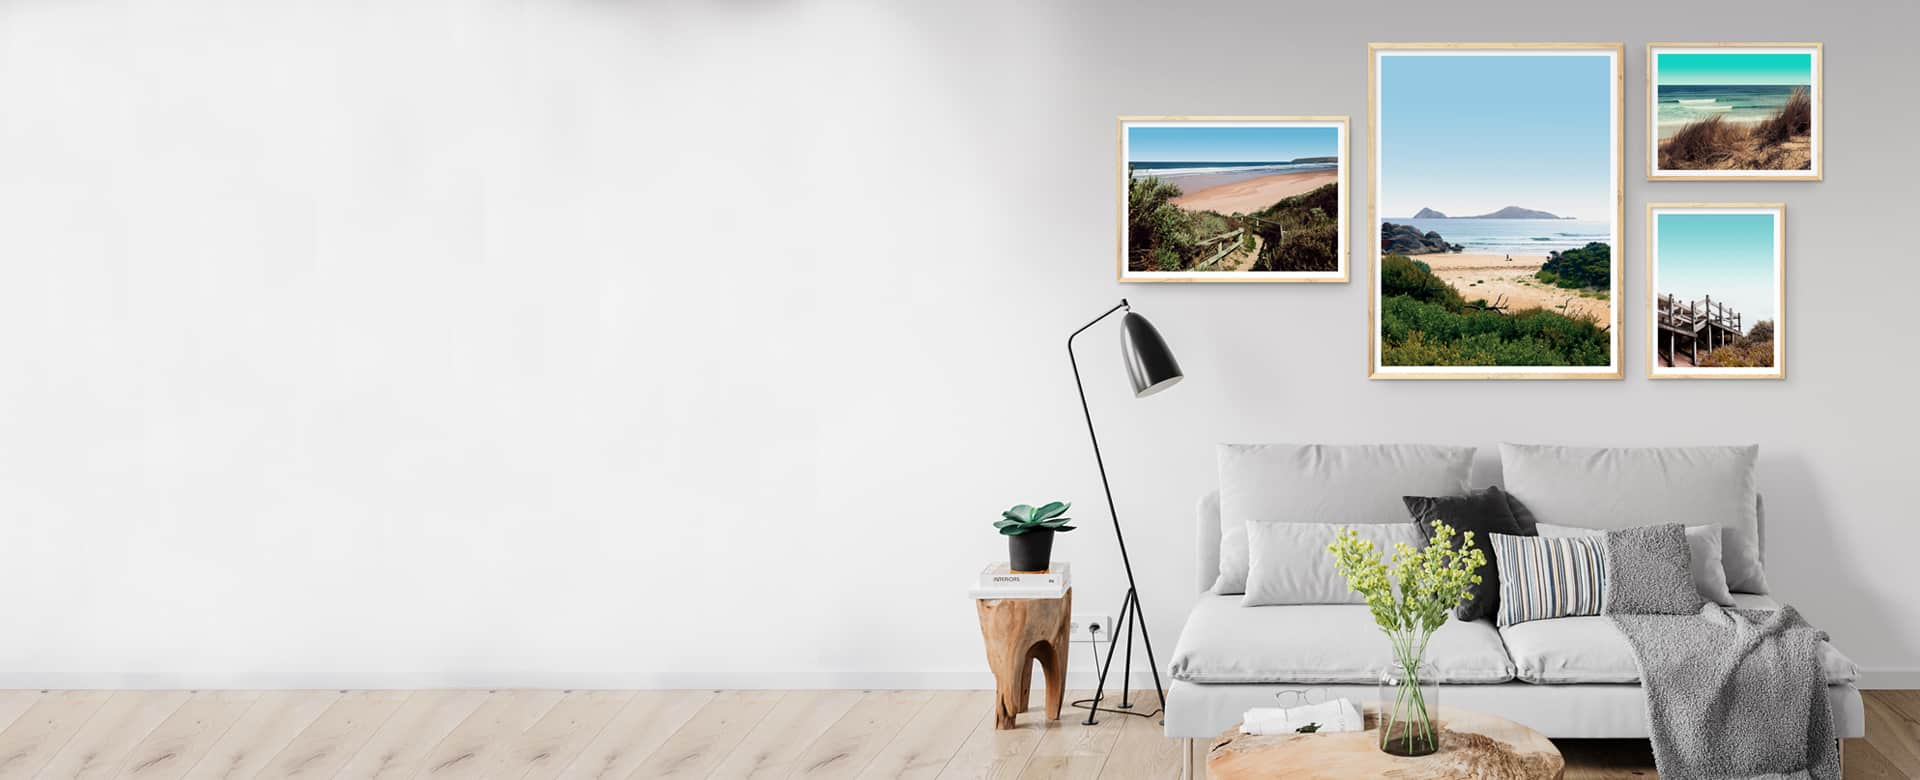 framed beach wall art prints collection